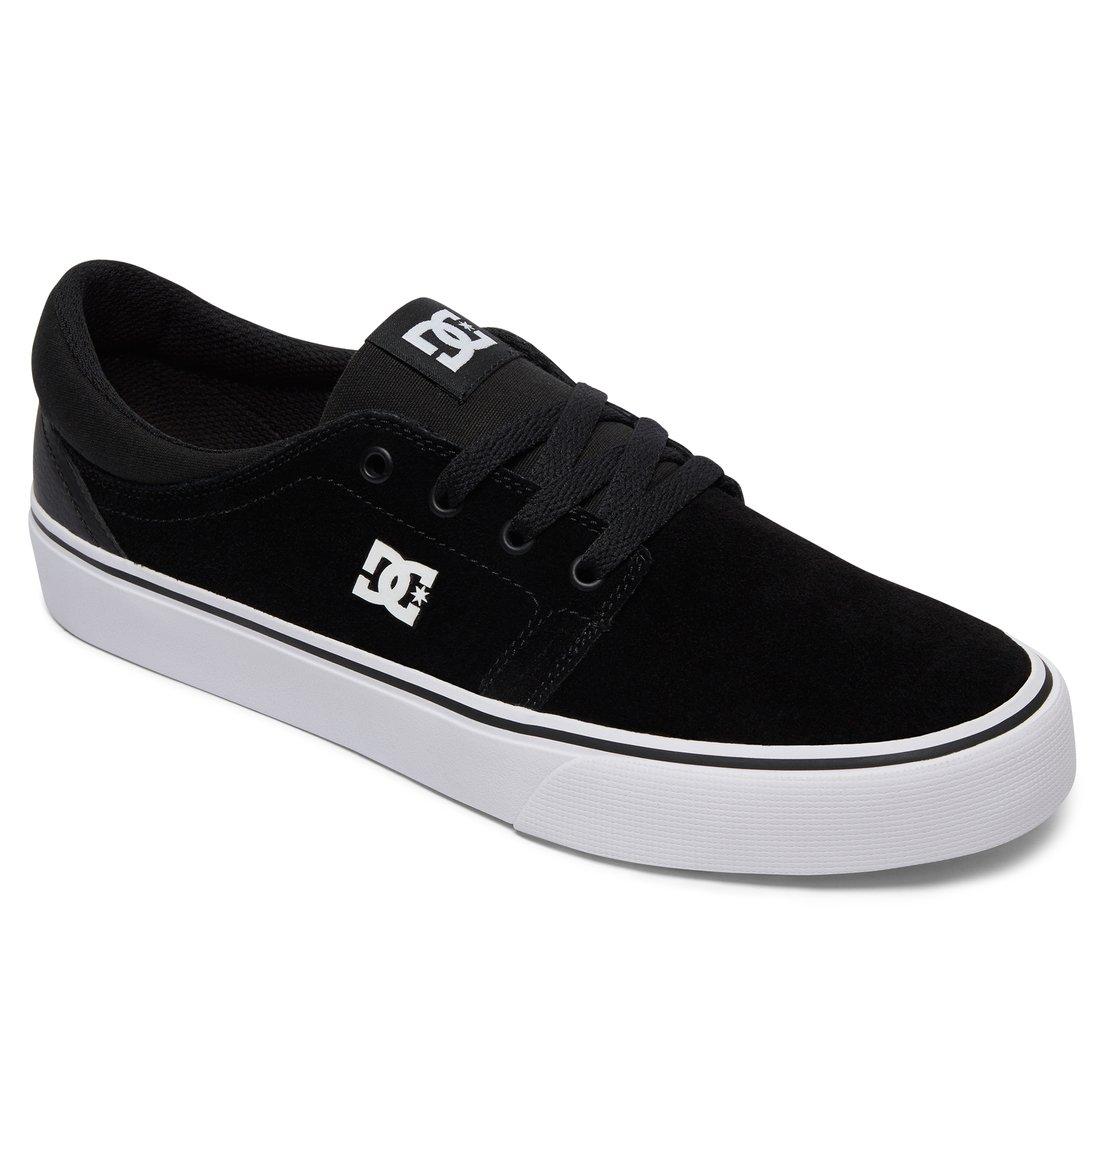 Skates shoes - DC TRASE